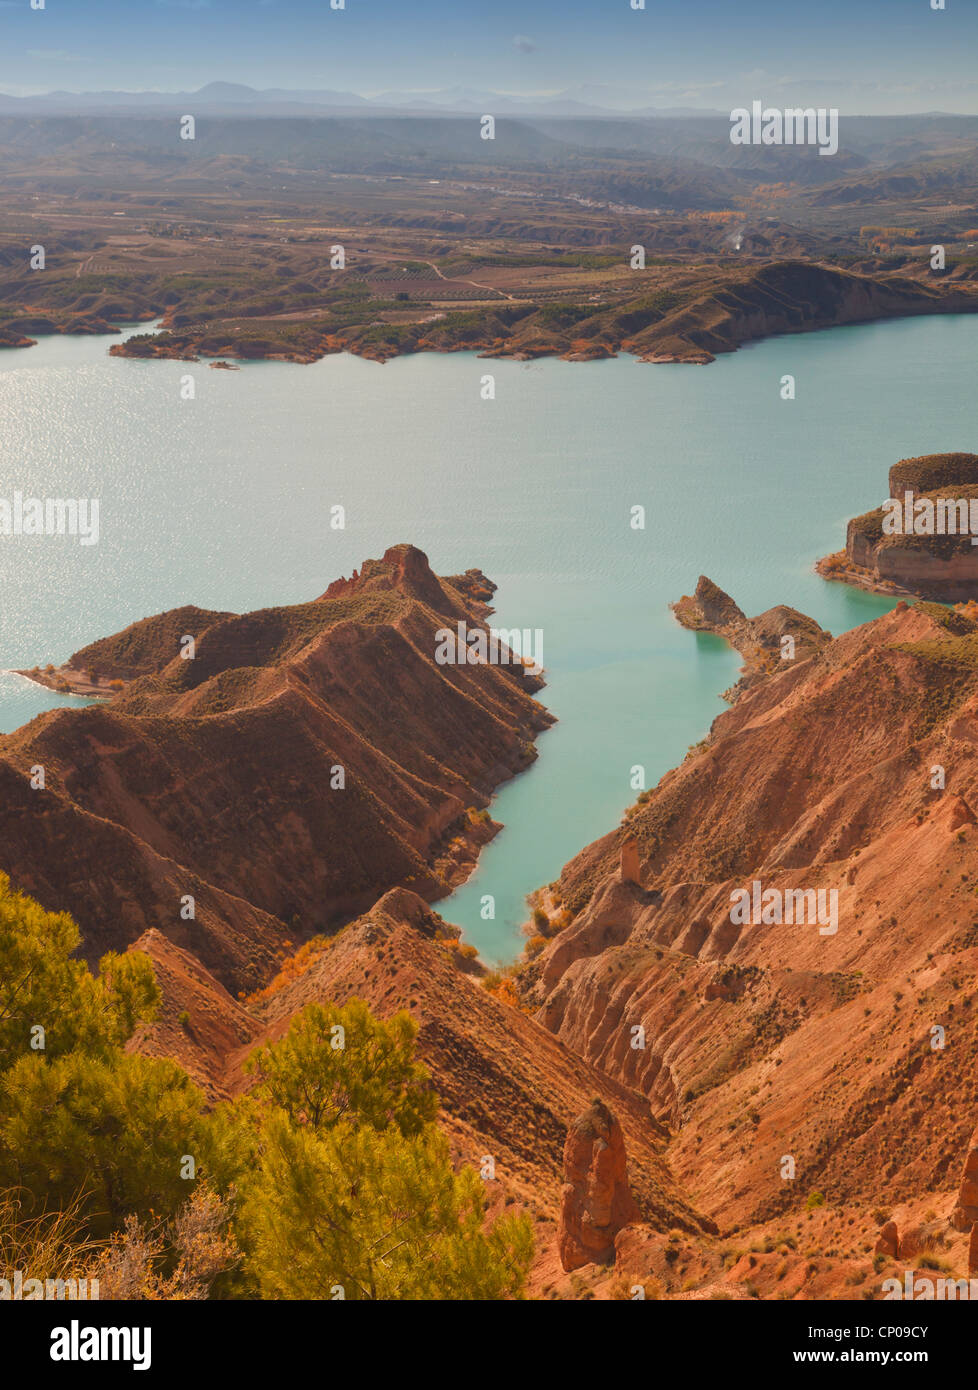 Spain Reservoir Stock Photos & Spain Reservoir Stock Images